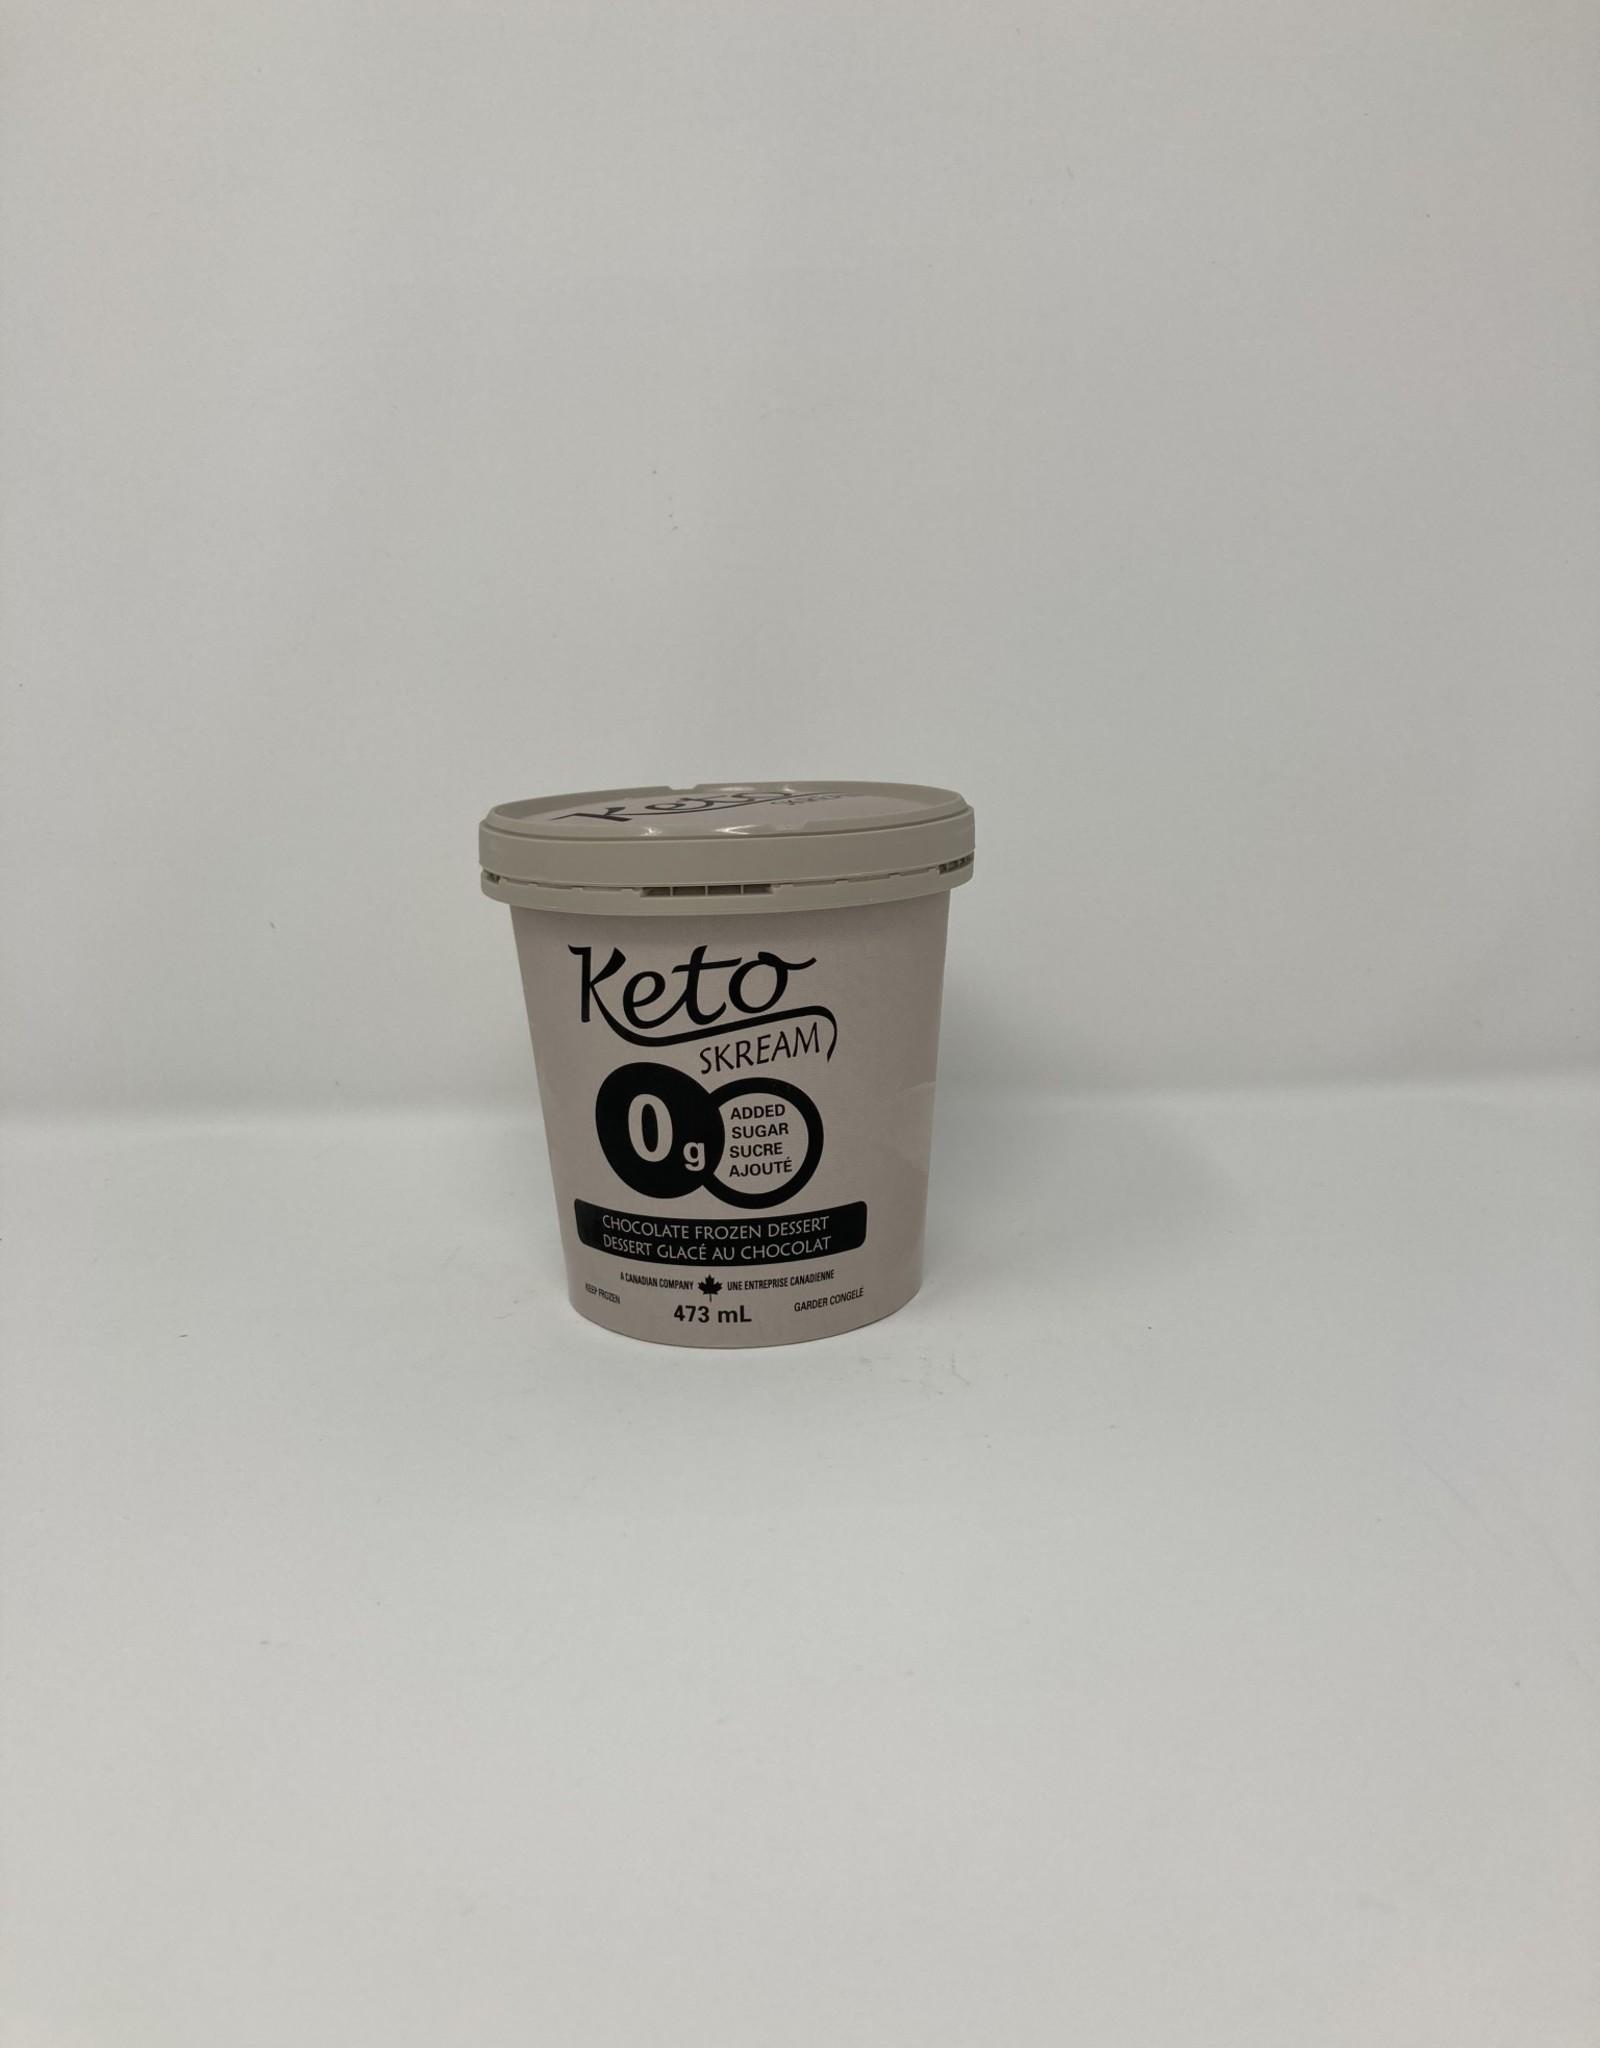 Keto Scream Keto Scream - Frozen Dessert, Chocolate